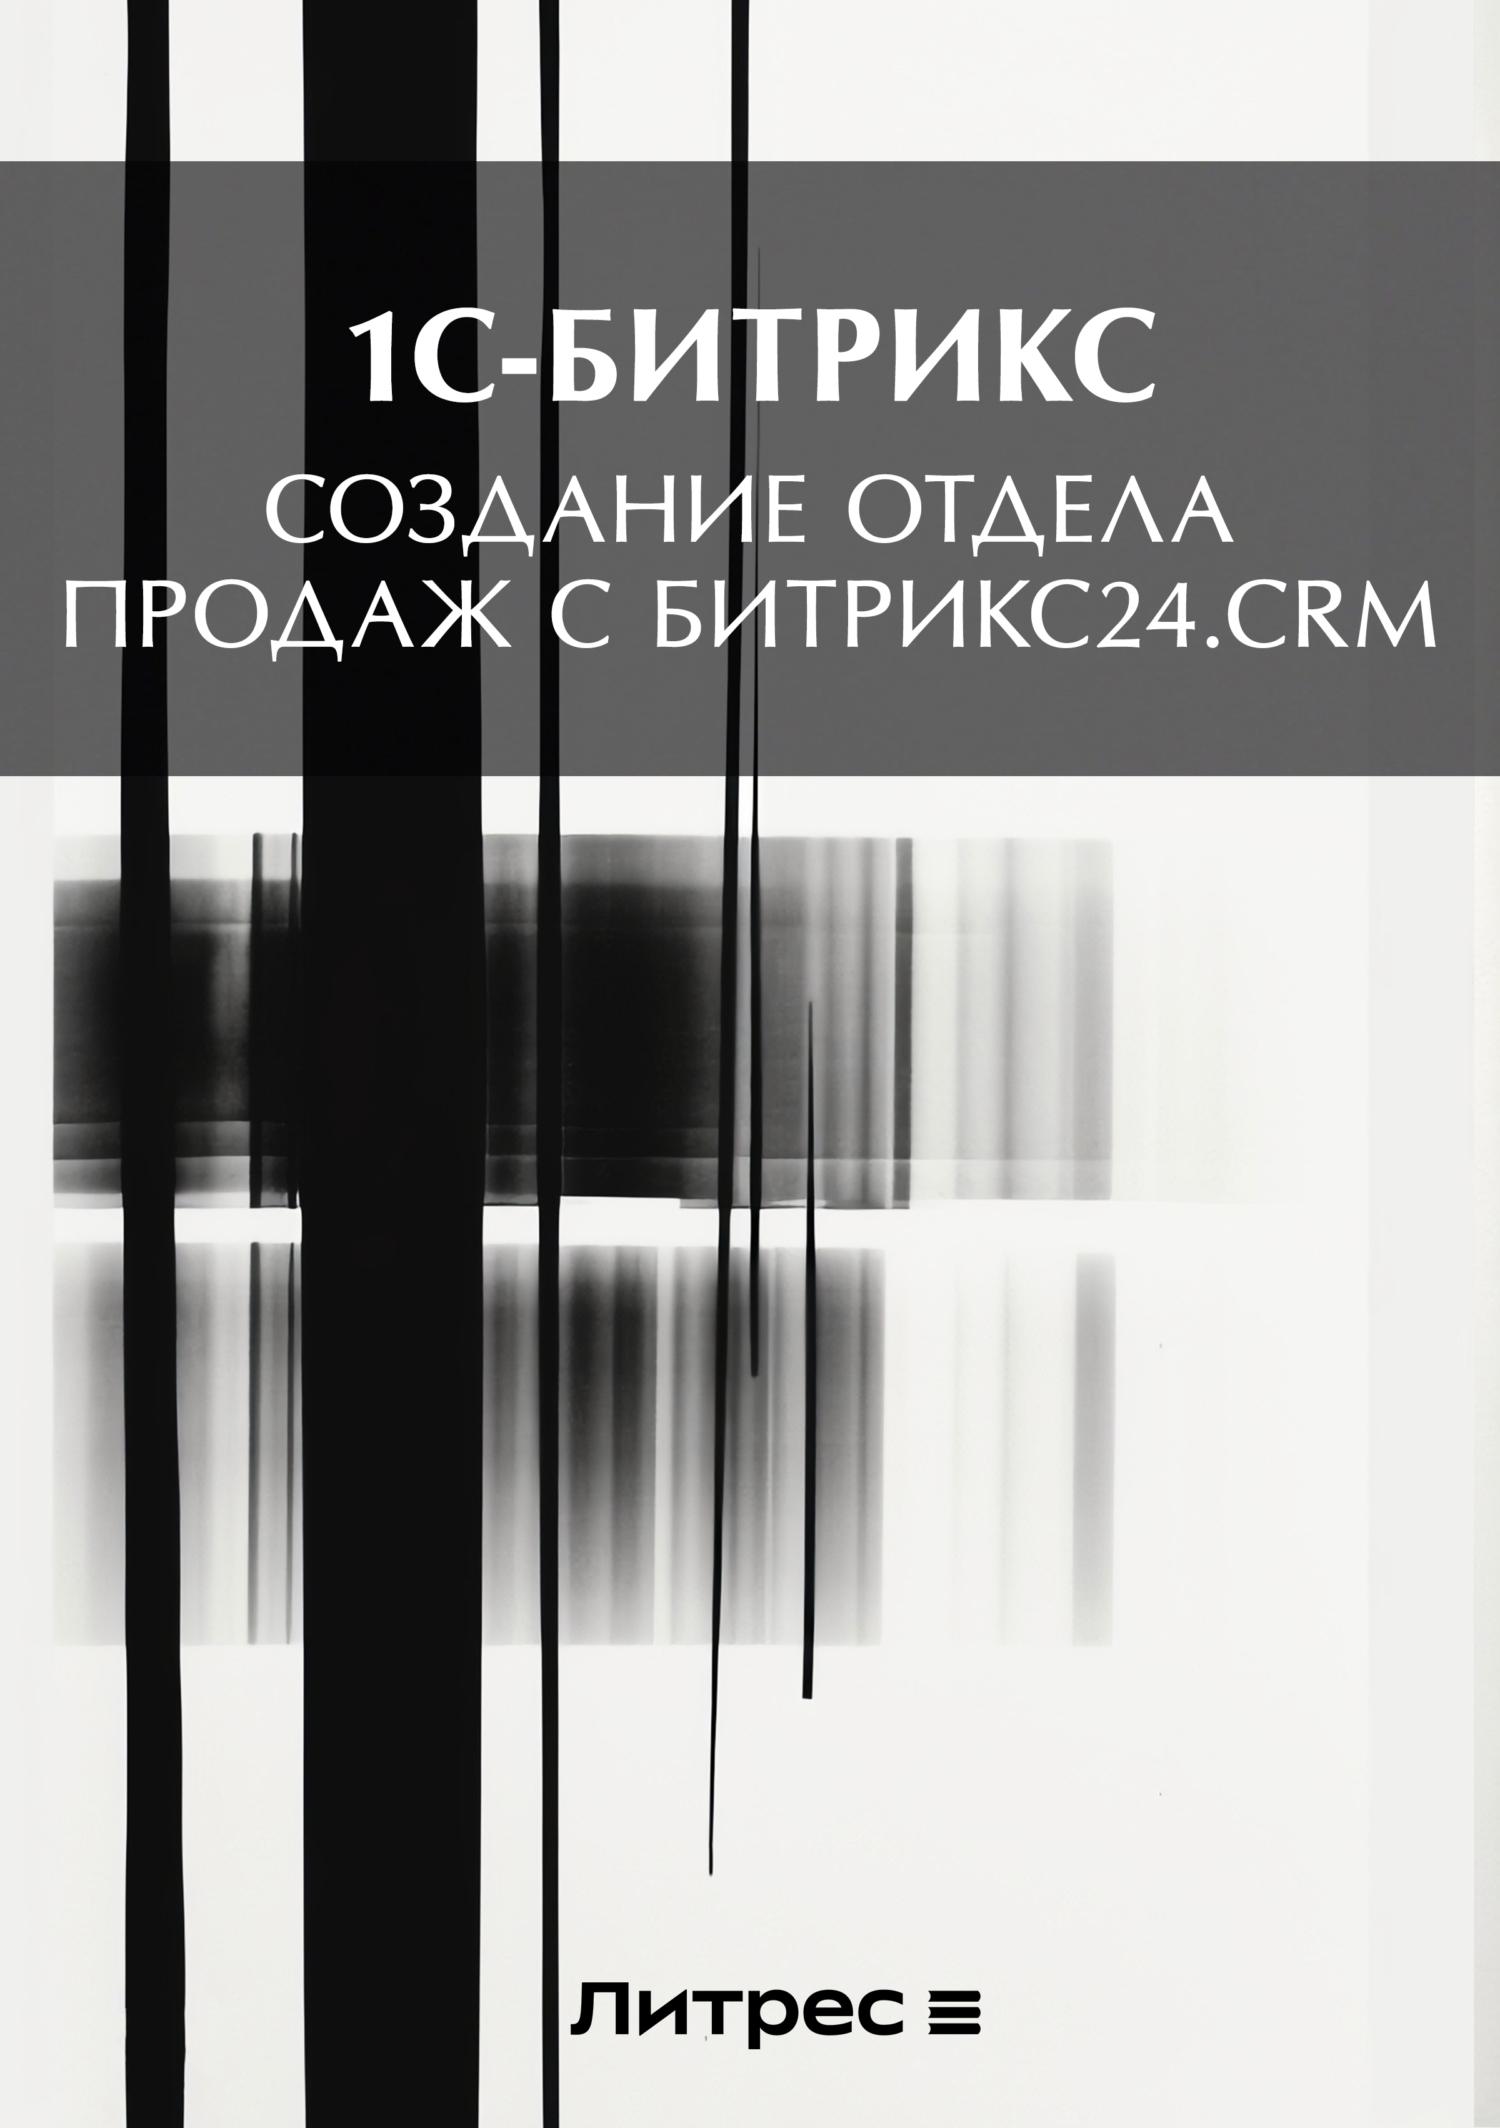 1С-Битрикс Создание отдела продаж с Битрикс24.CRM